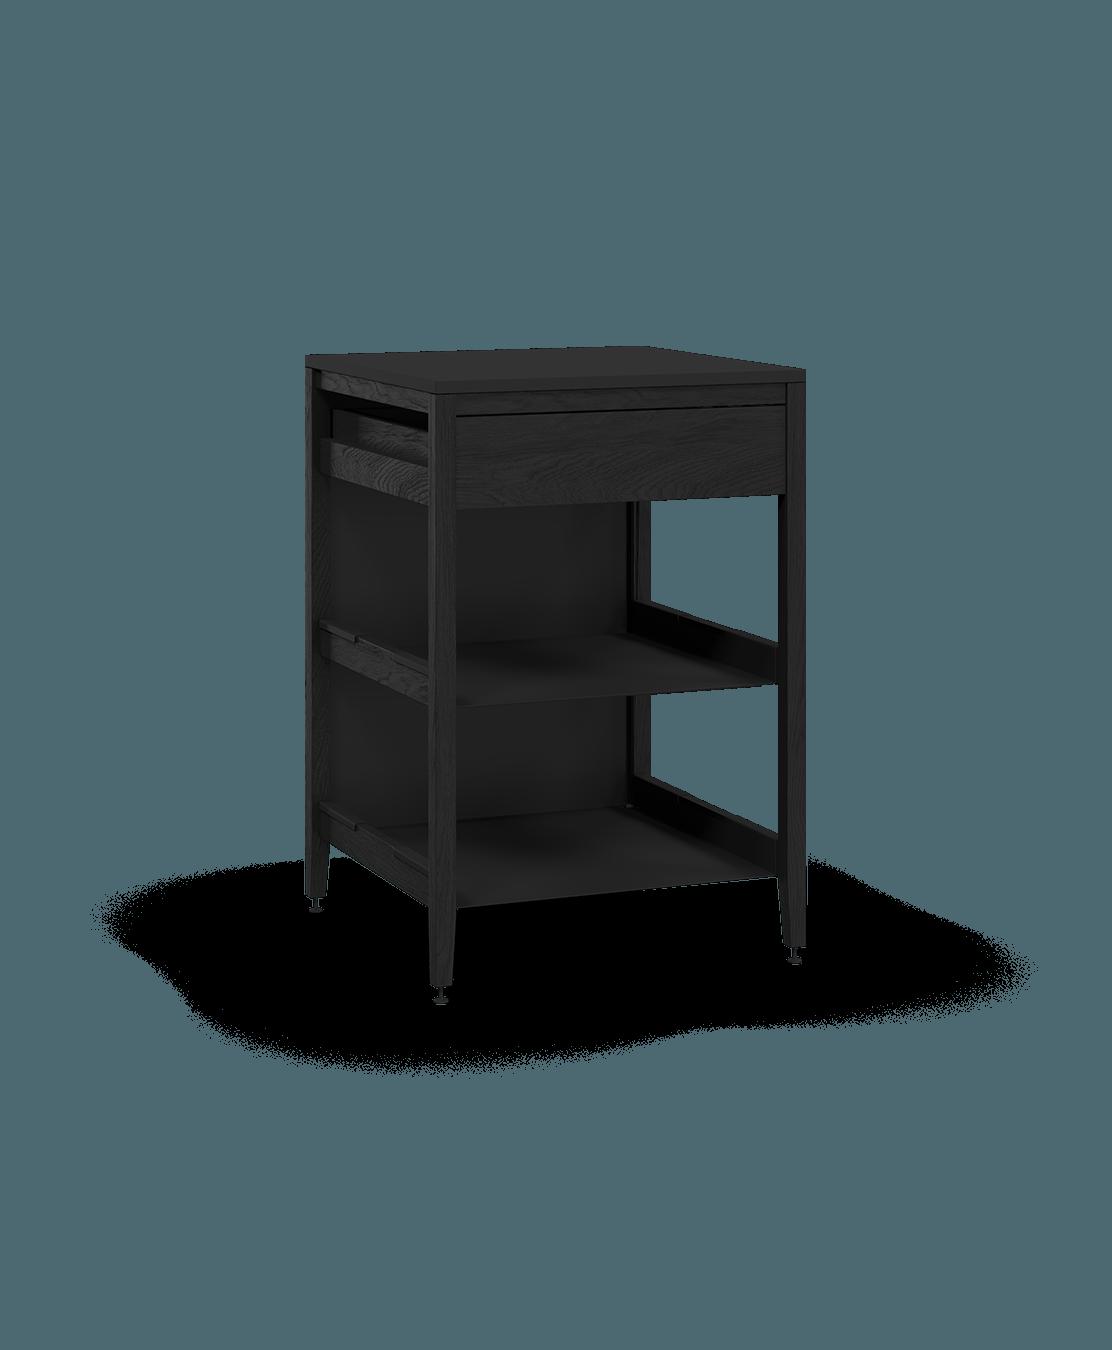 coquo radix midnight black stained oak solid wood modular 2 shelves 1 drawer base kitchen cabinet 27 inch C1-C-27TB-1022-BK